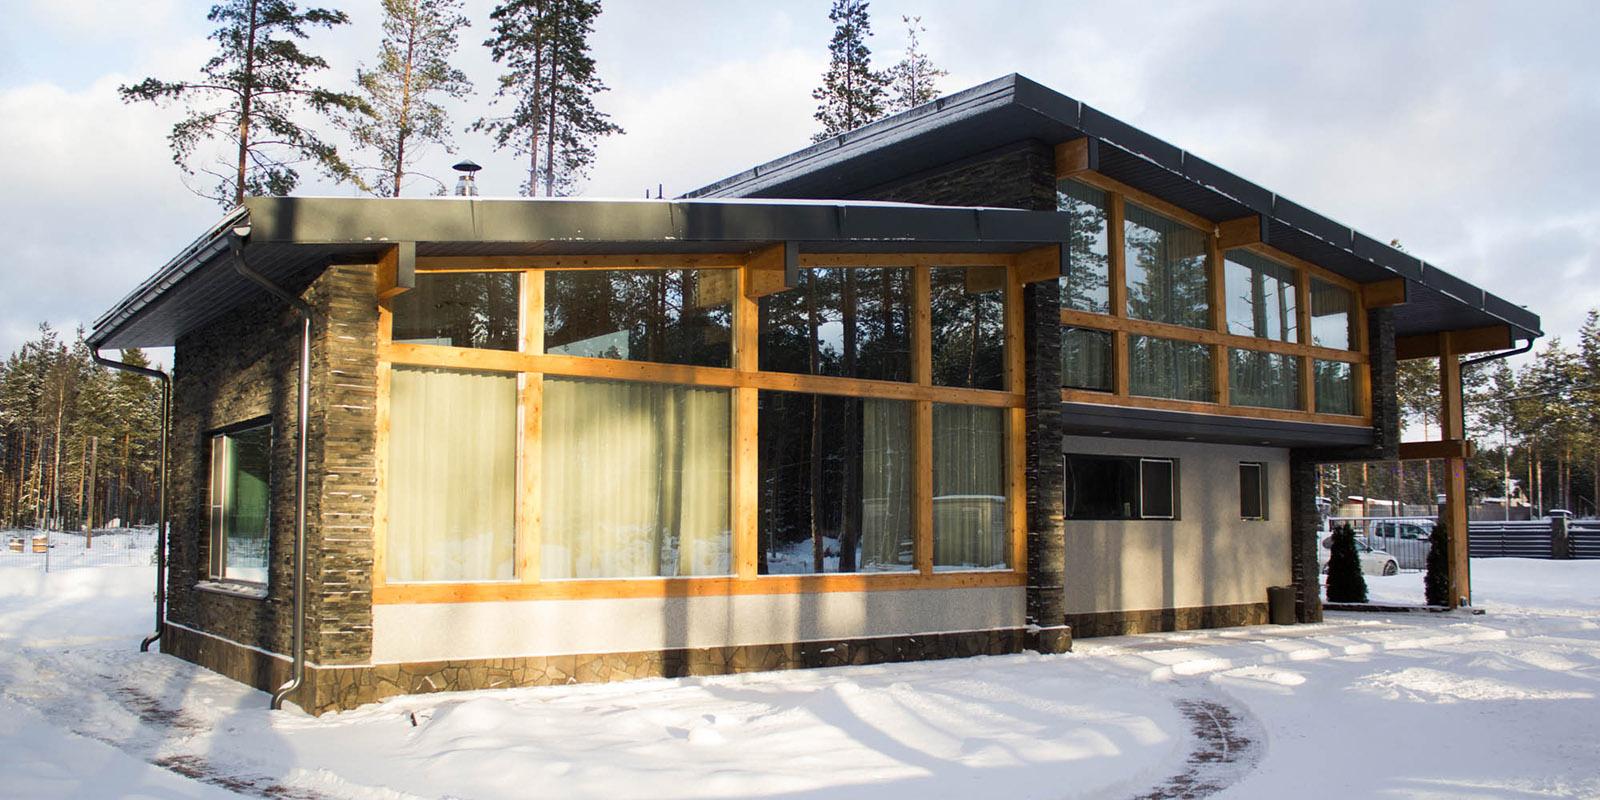 дом в скандинавском стиле от архитектурного бюро А.Никитина